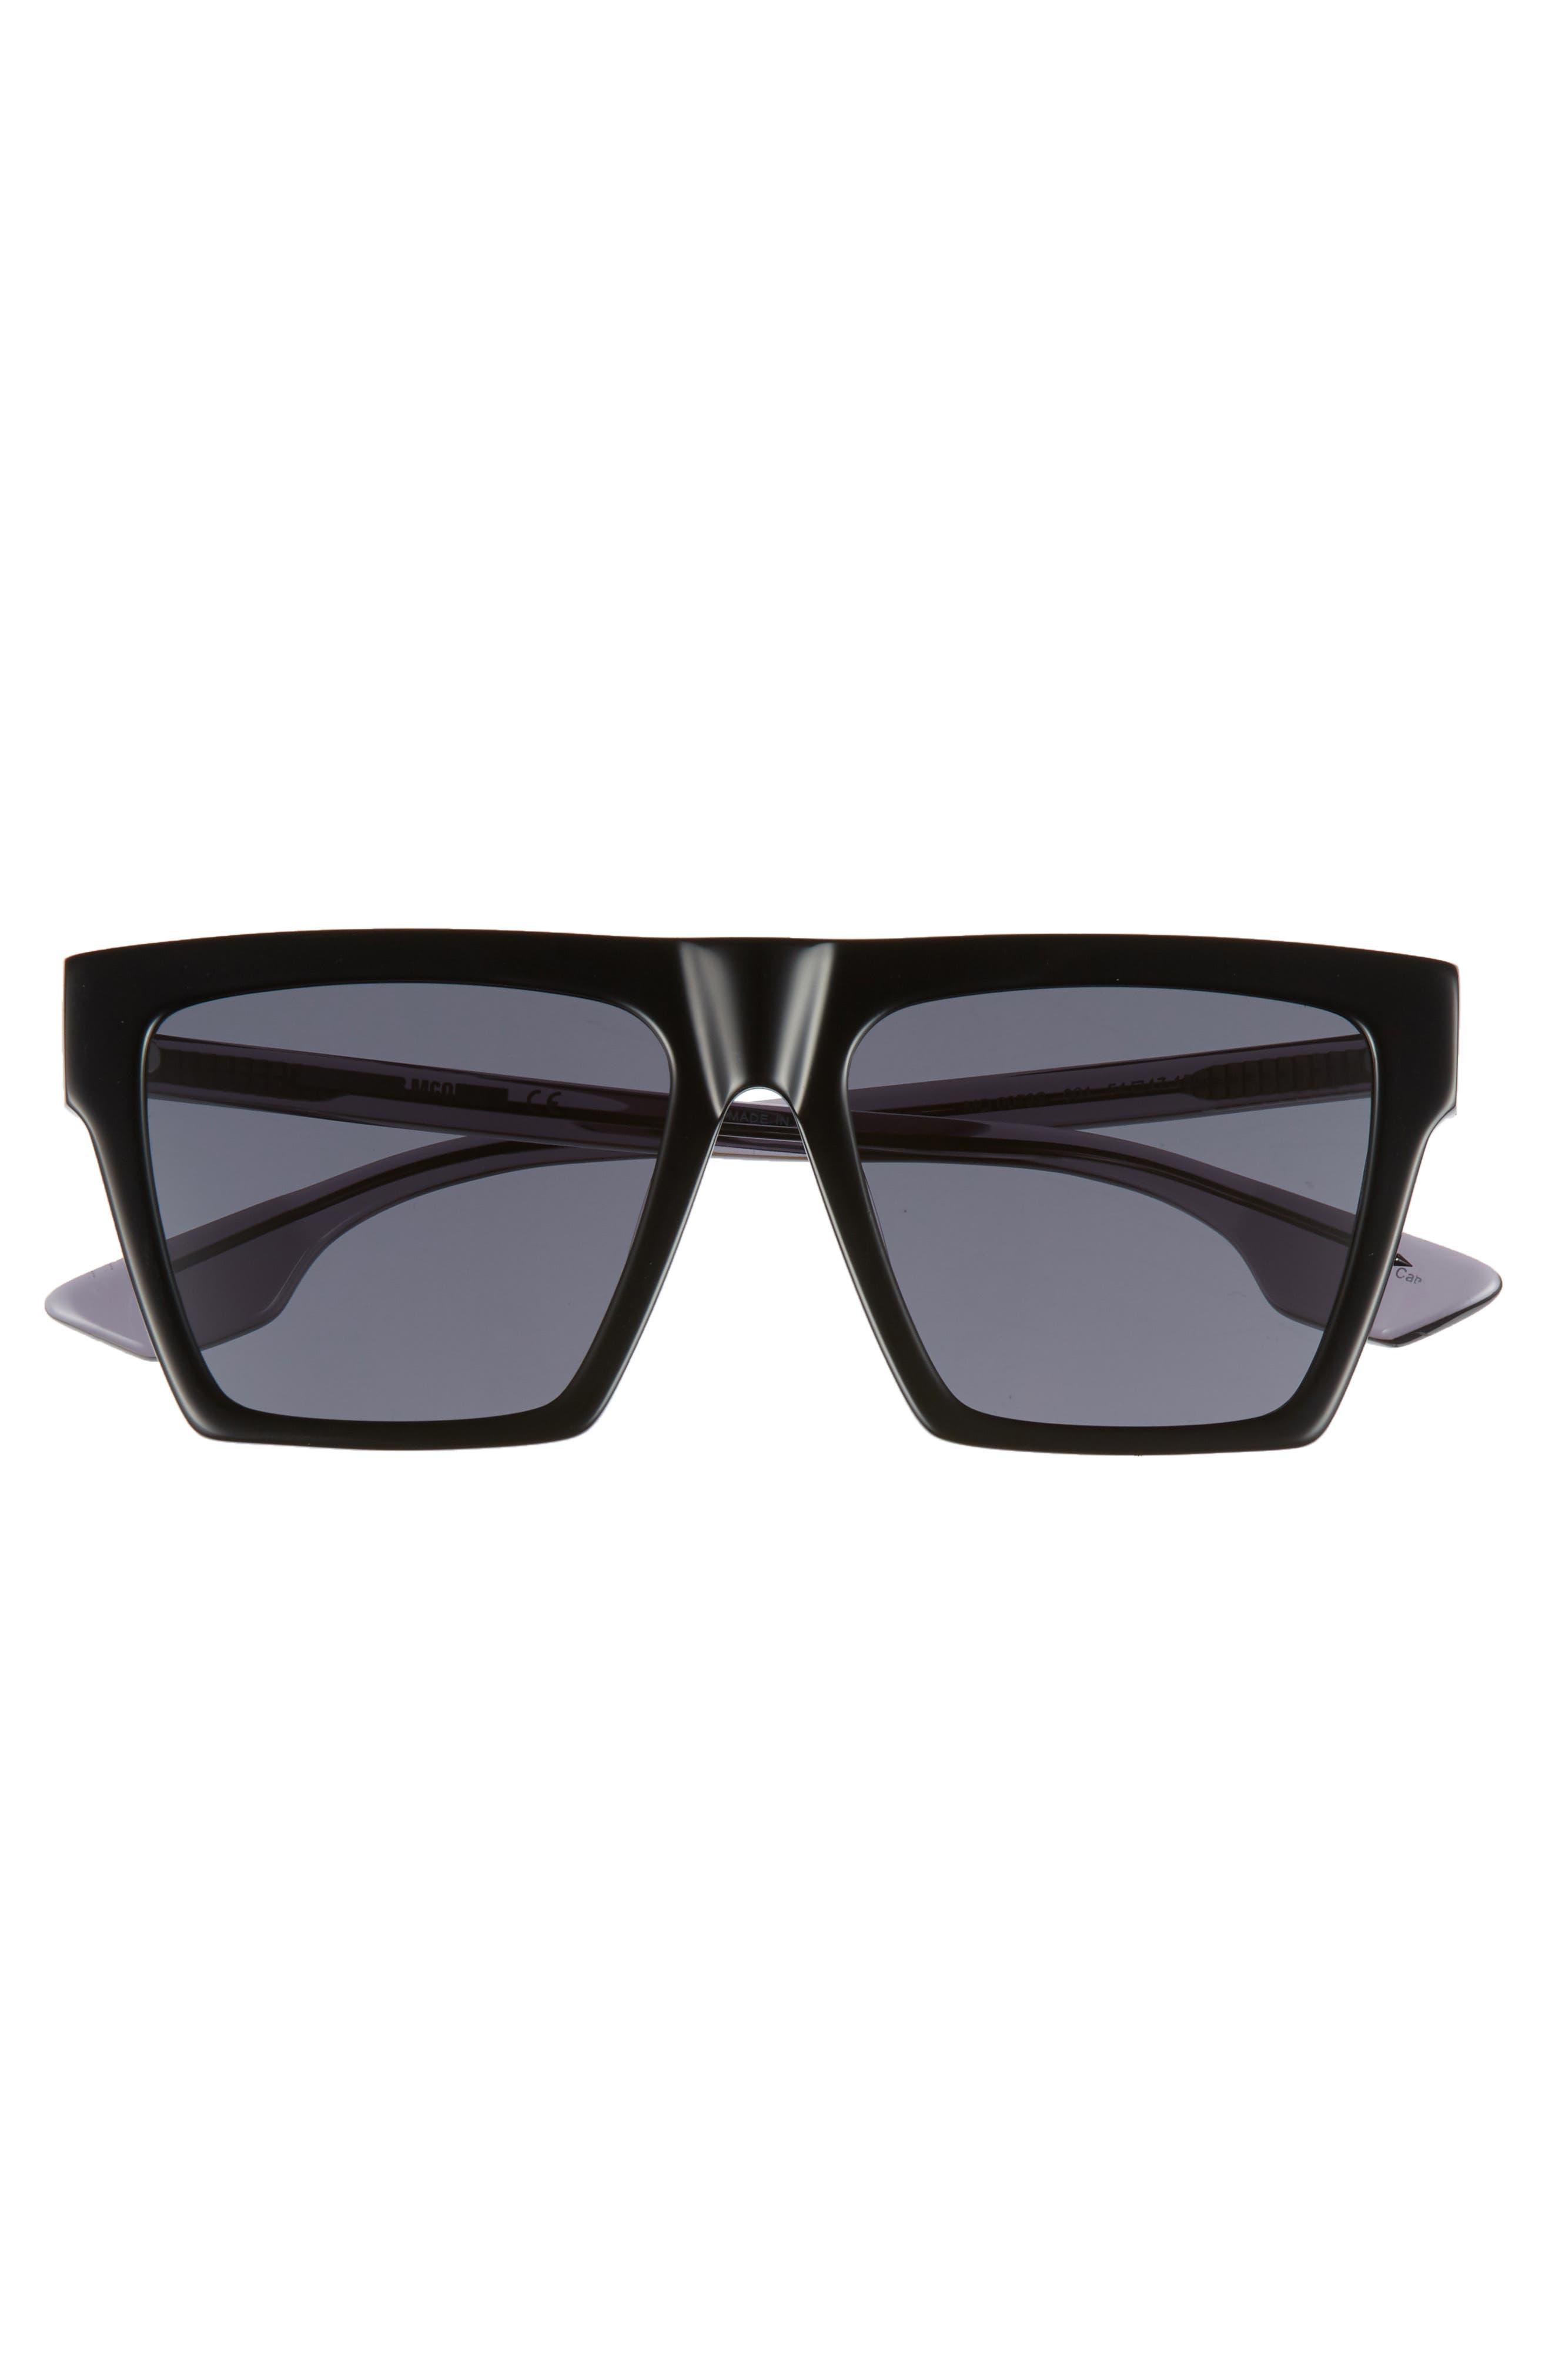 Alexander McQueen 54mm Flat Top Sunglasses,                             Alternate thumbnail 3, color,                             BLACK